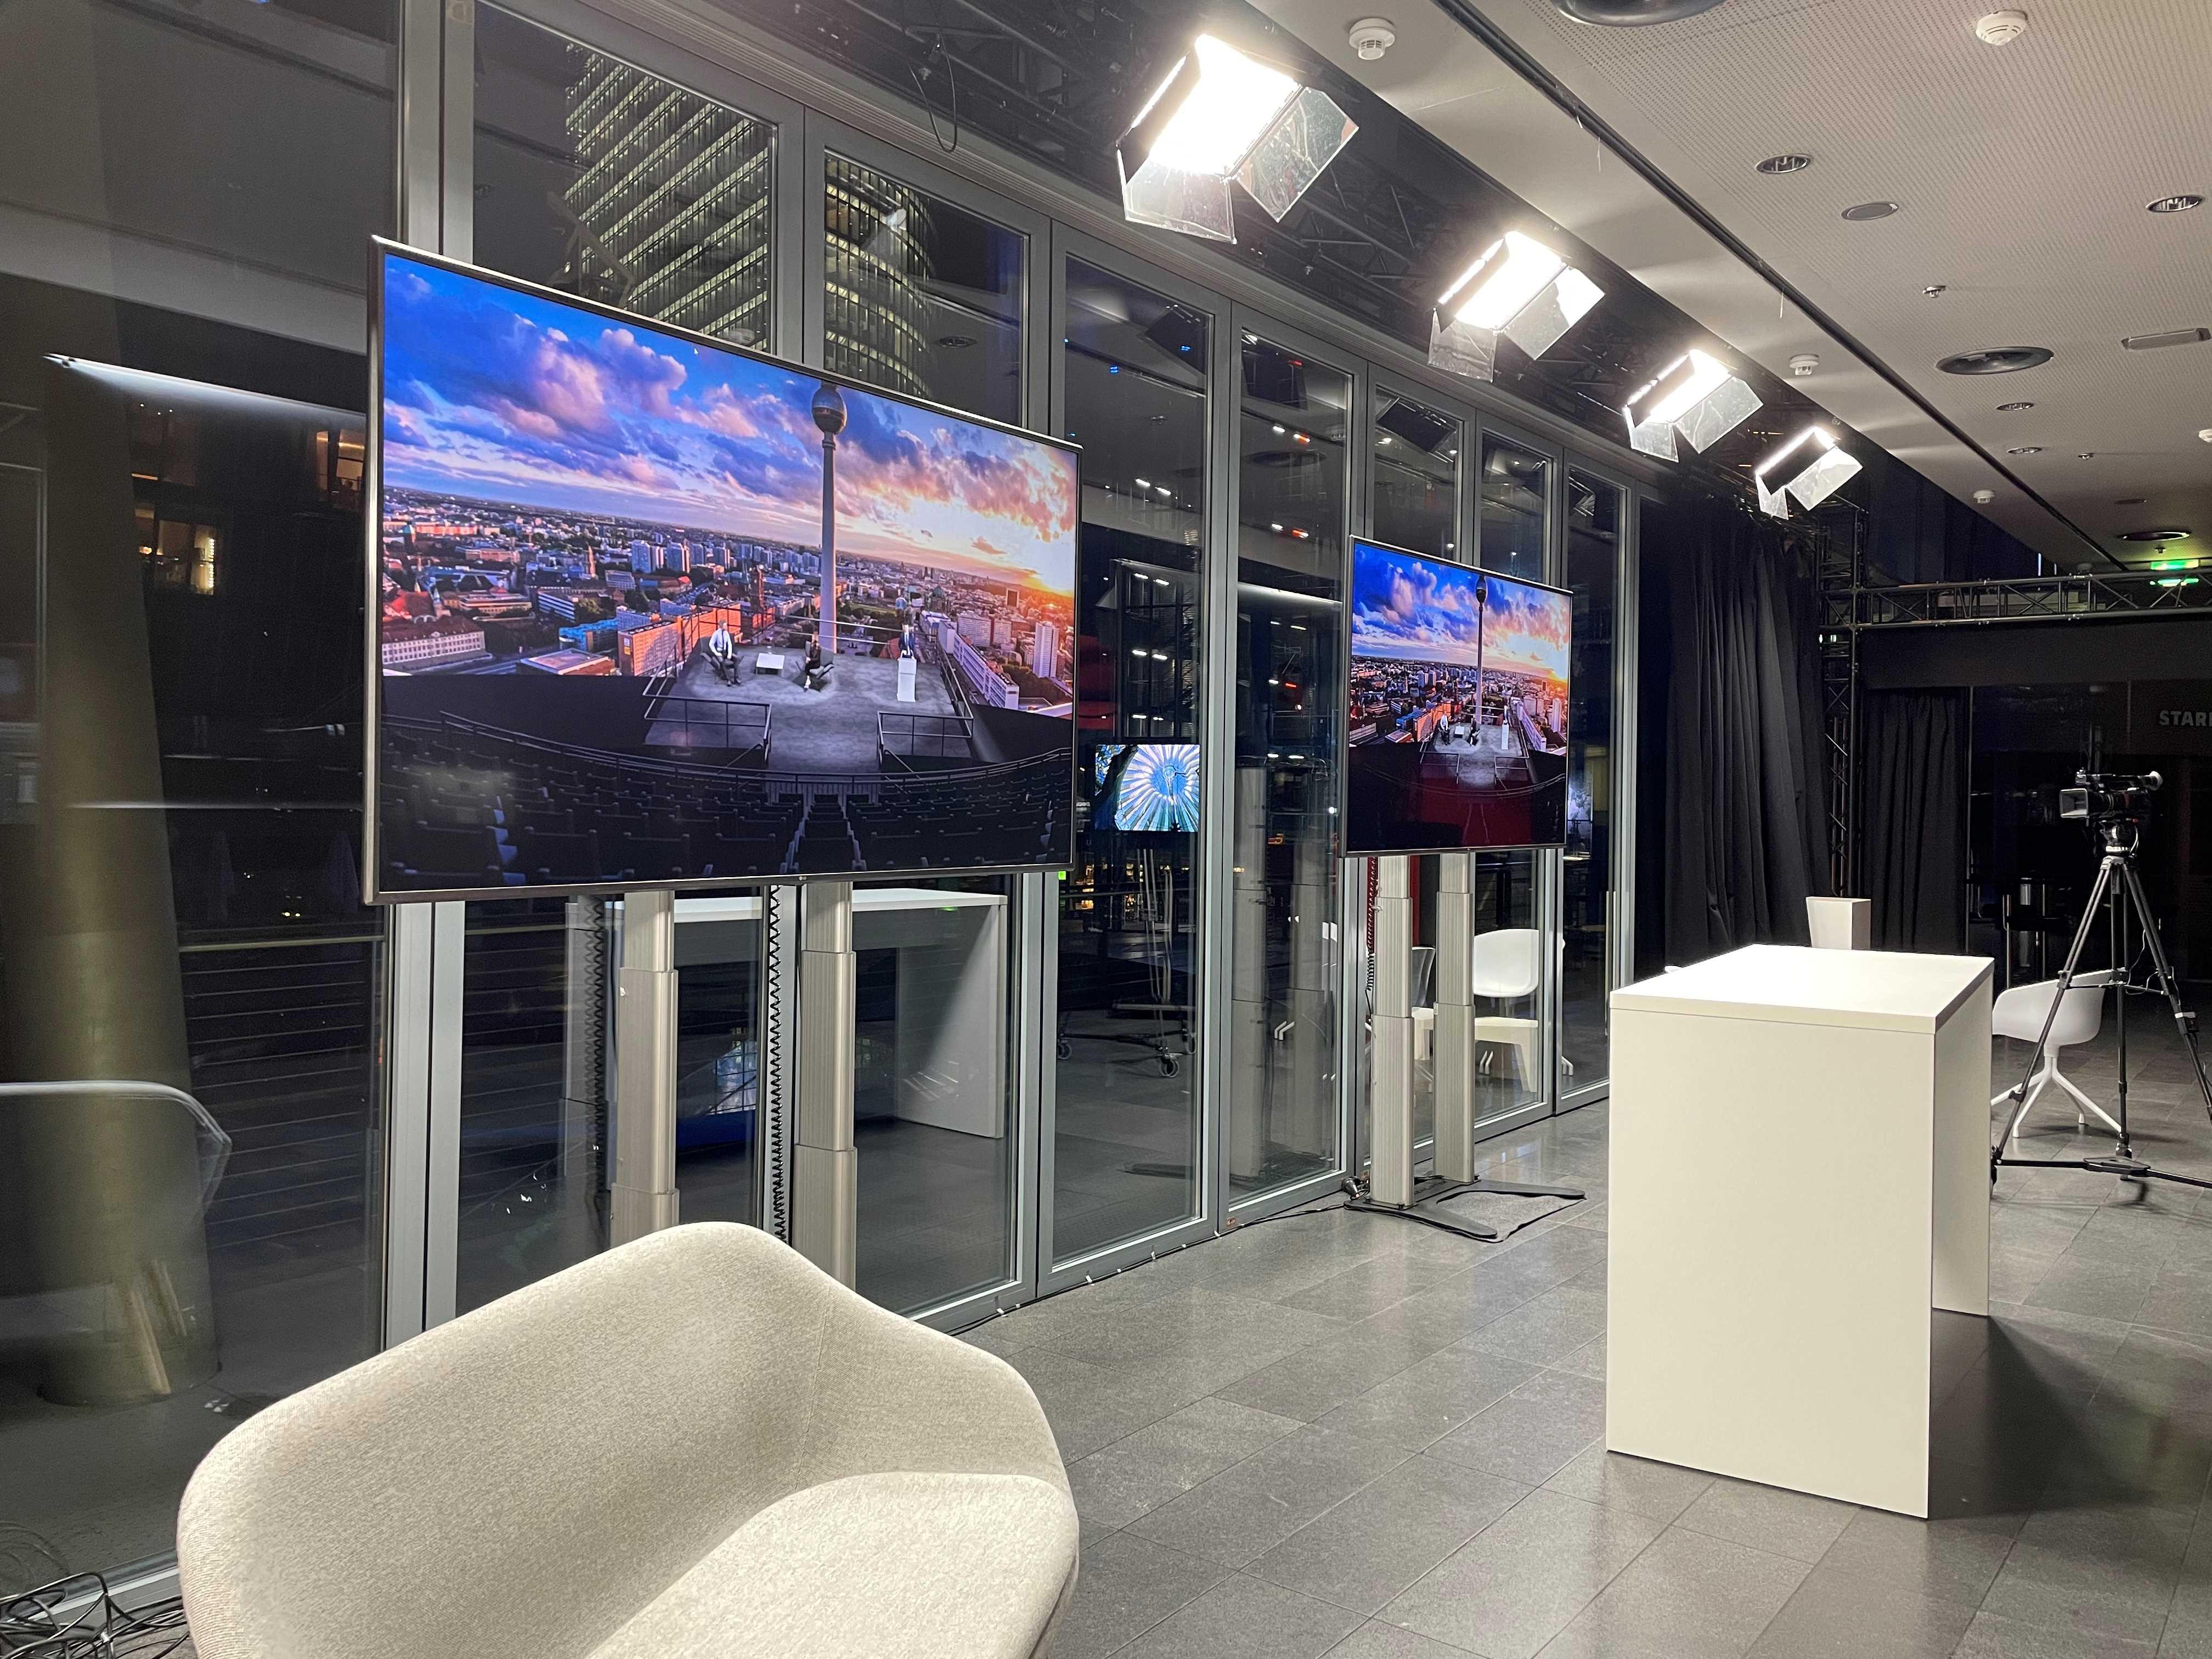 Studio für digitale Events im Imax